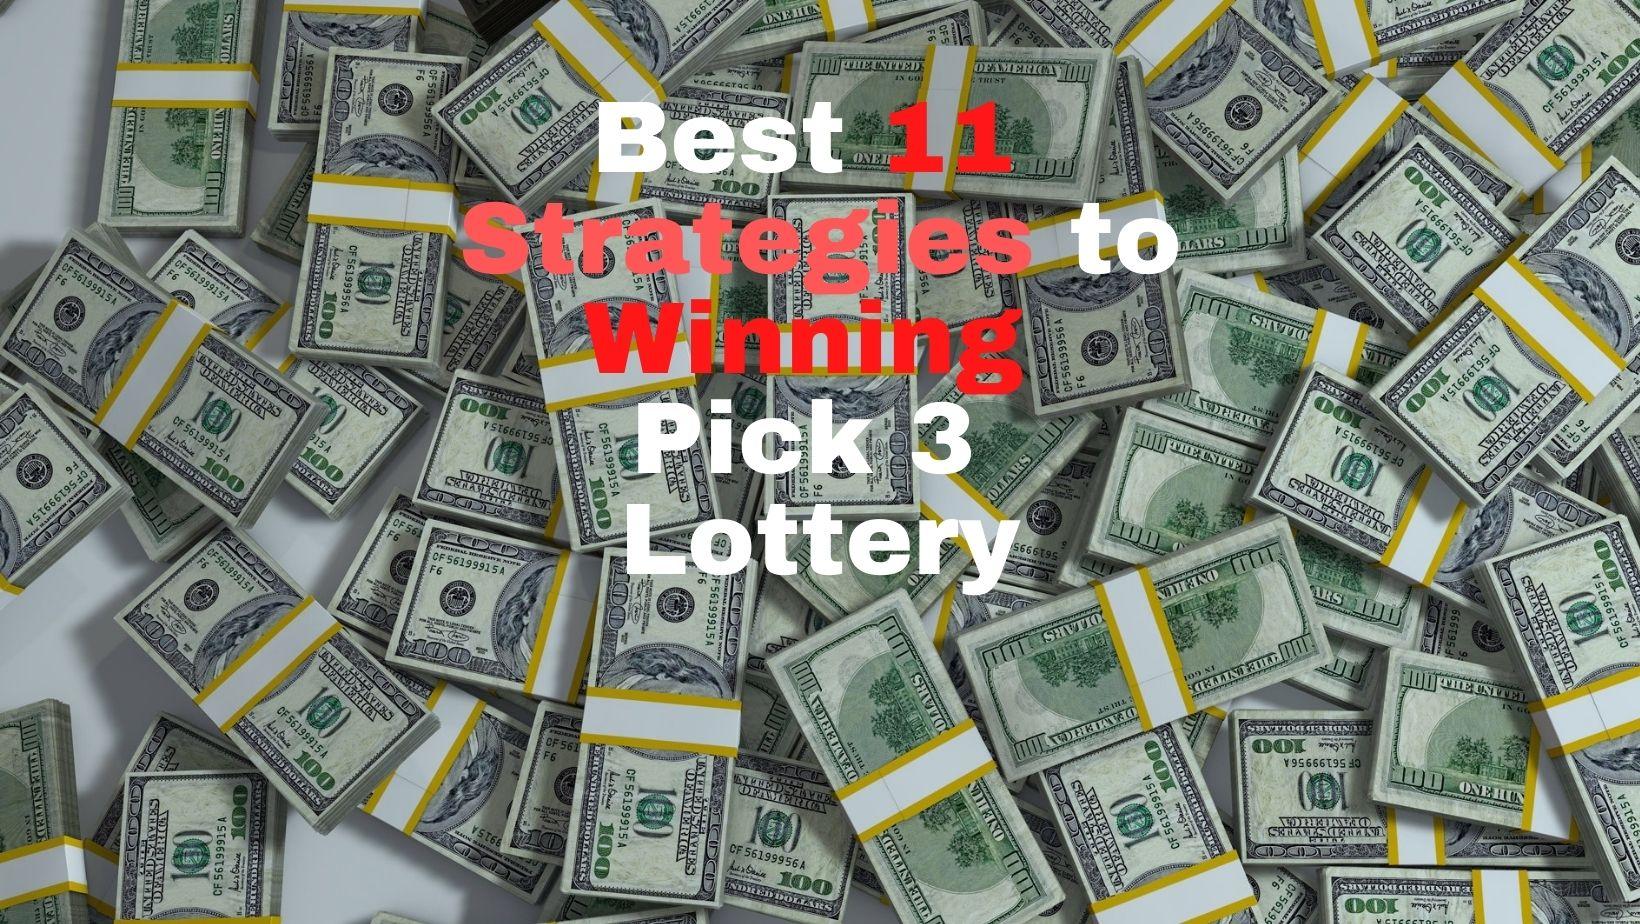 Pick 3 lotteries Strategies